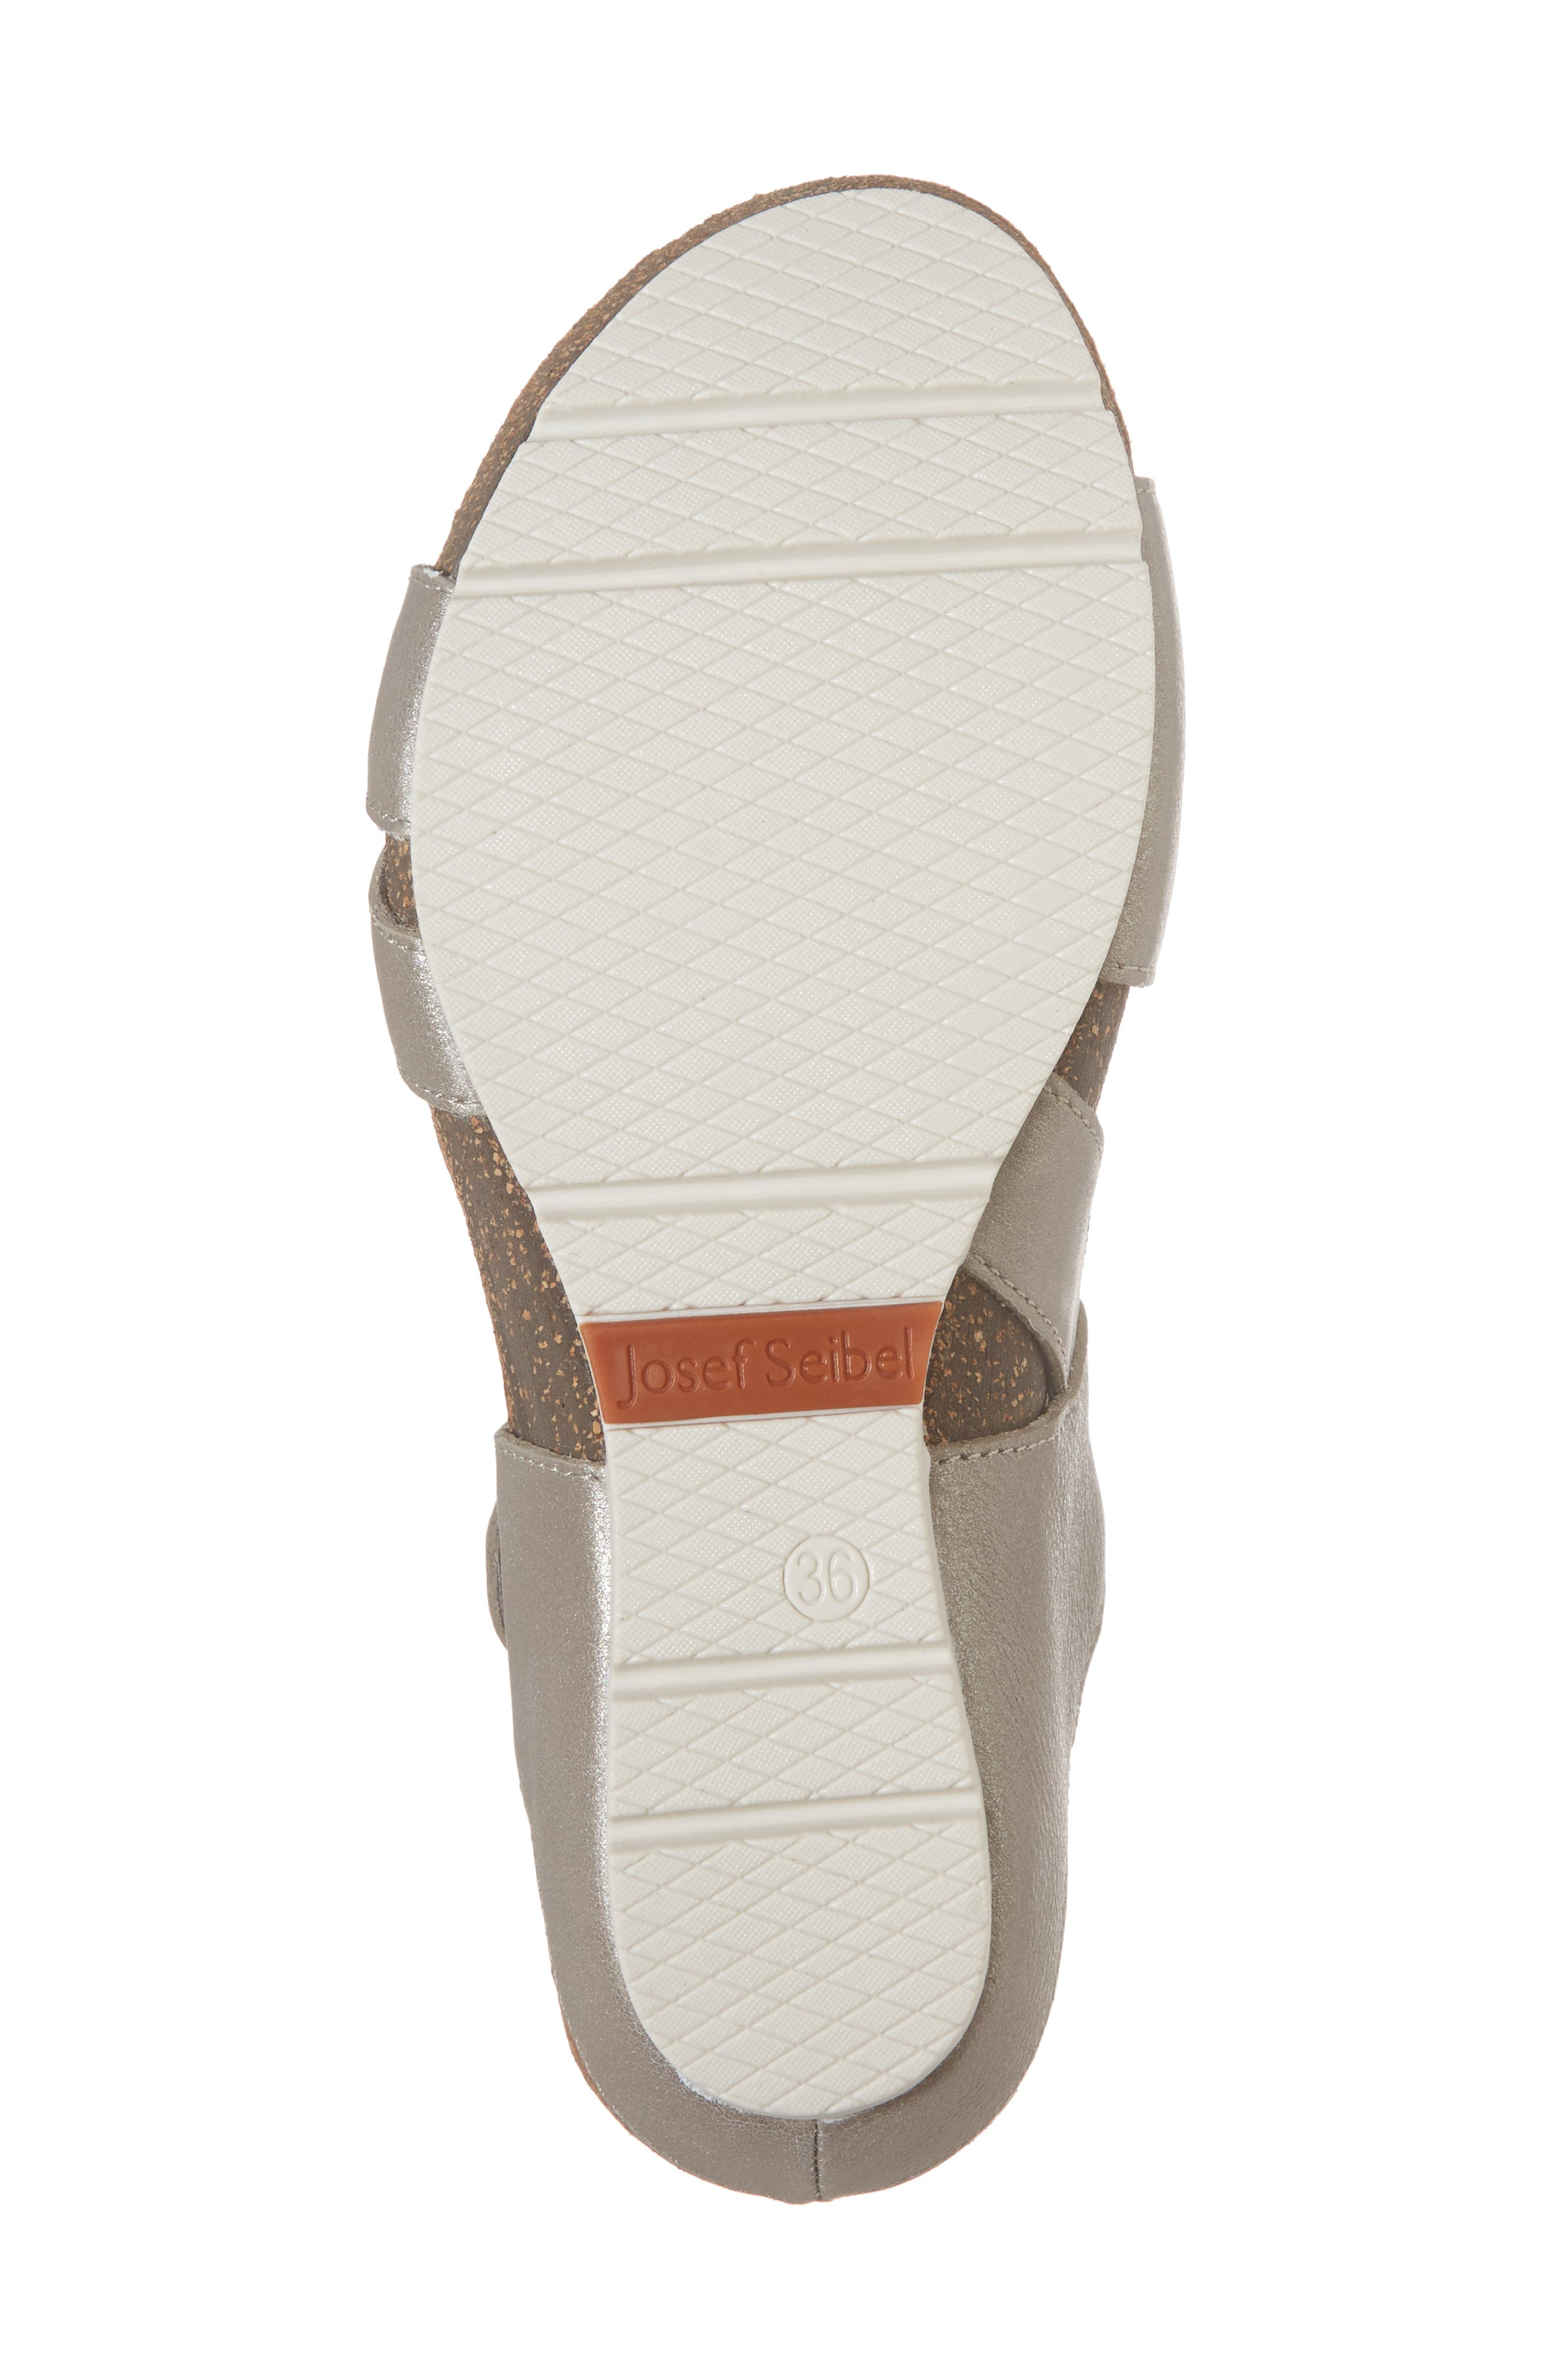 Hailey 33 Sandal,                             Alternate thumbnail 6, color,                             PLATINUM LEATHER